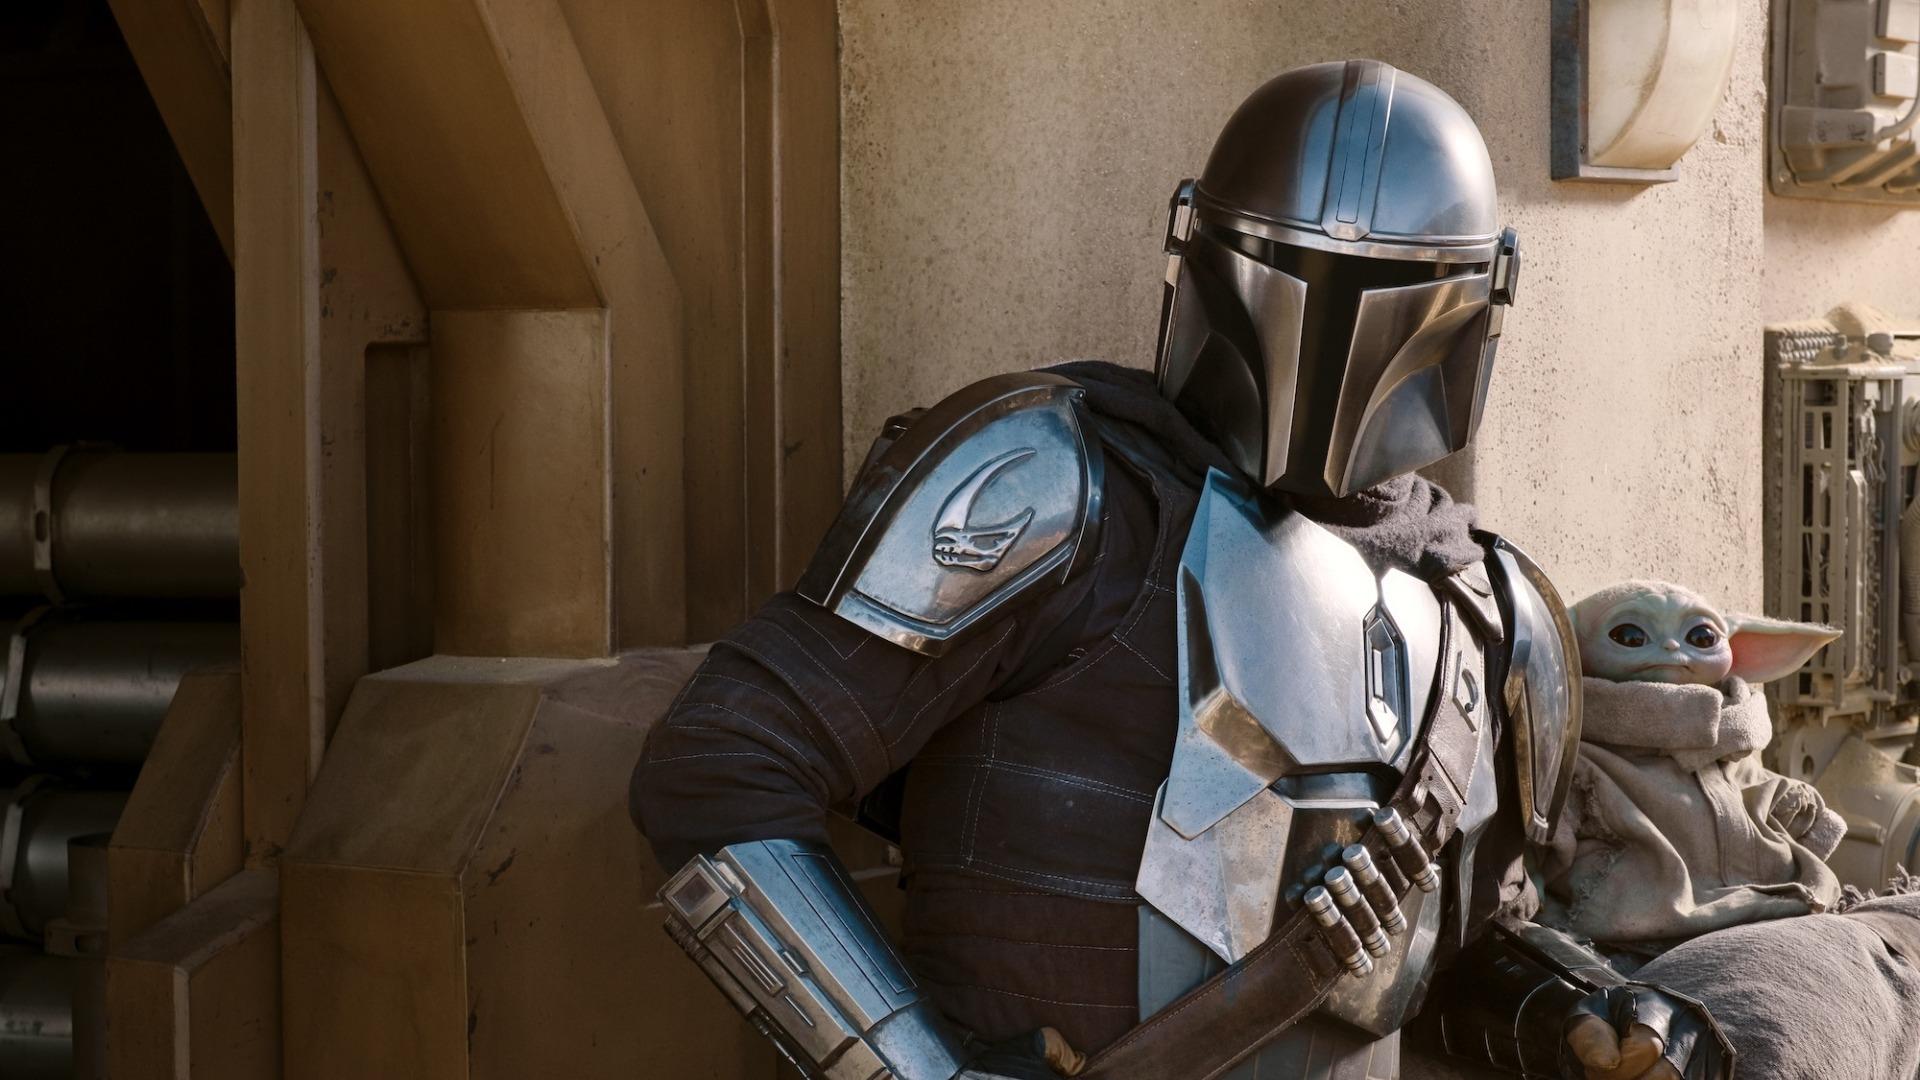 The Mandalorian season 3, Obi-Wan Kenobi and Andor will reportedly release on Disney Plus in 2022